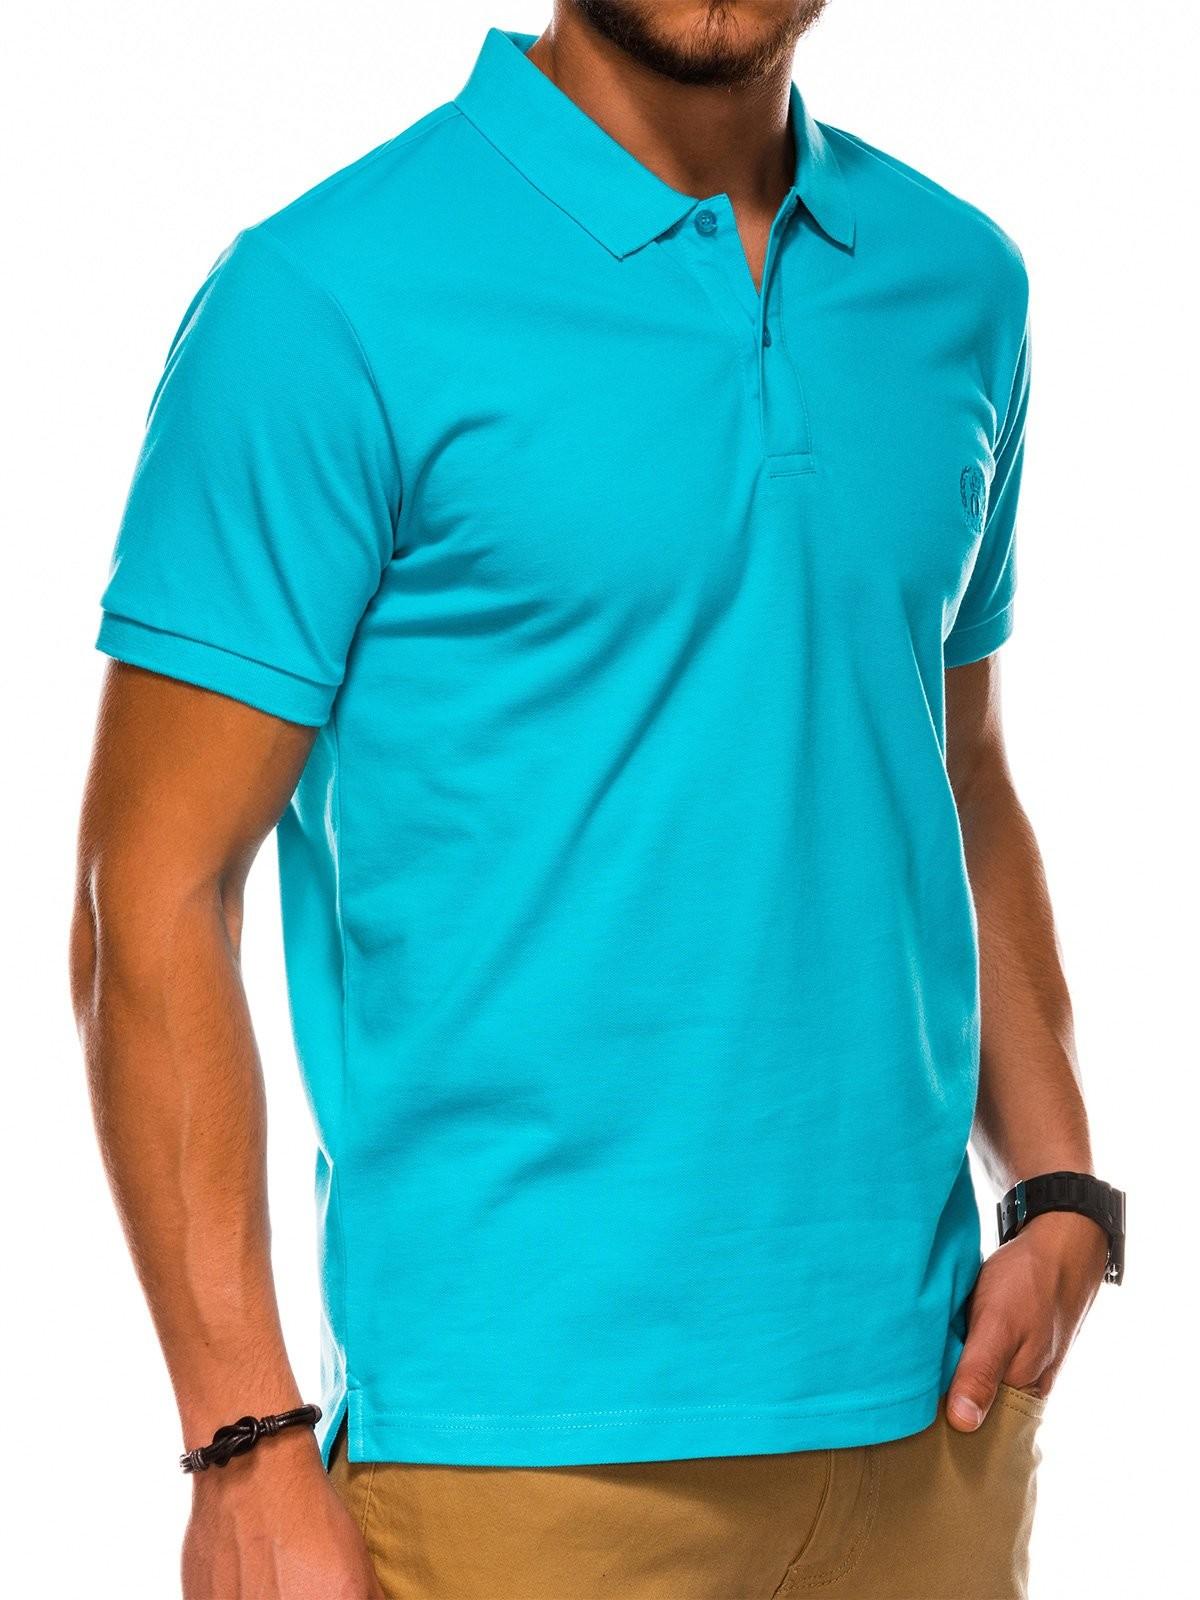 Ombre Clothing Koszulka męska Polo bez nadruku S1048 - turkusowa